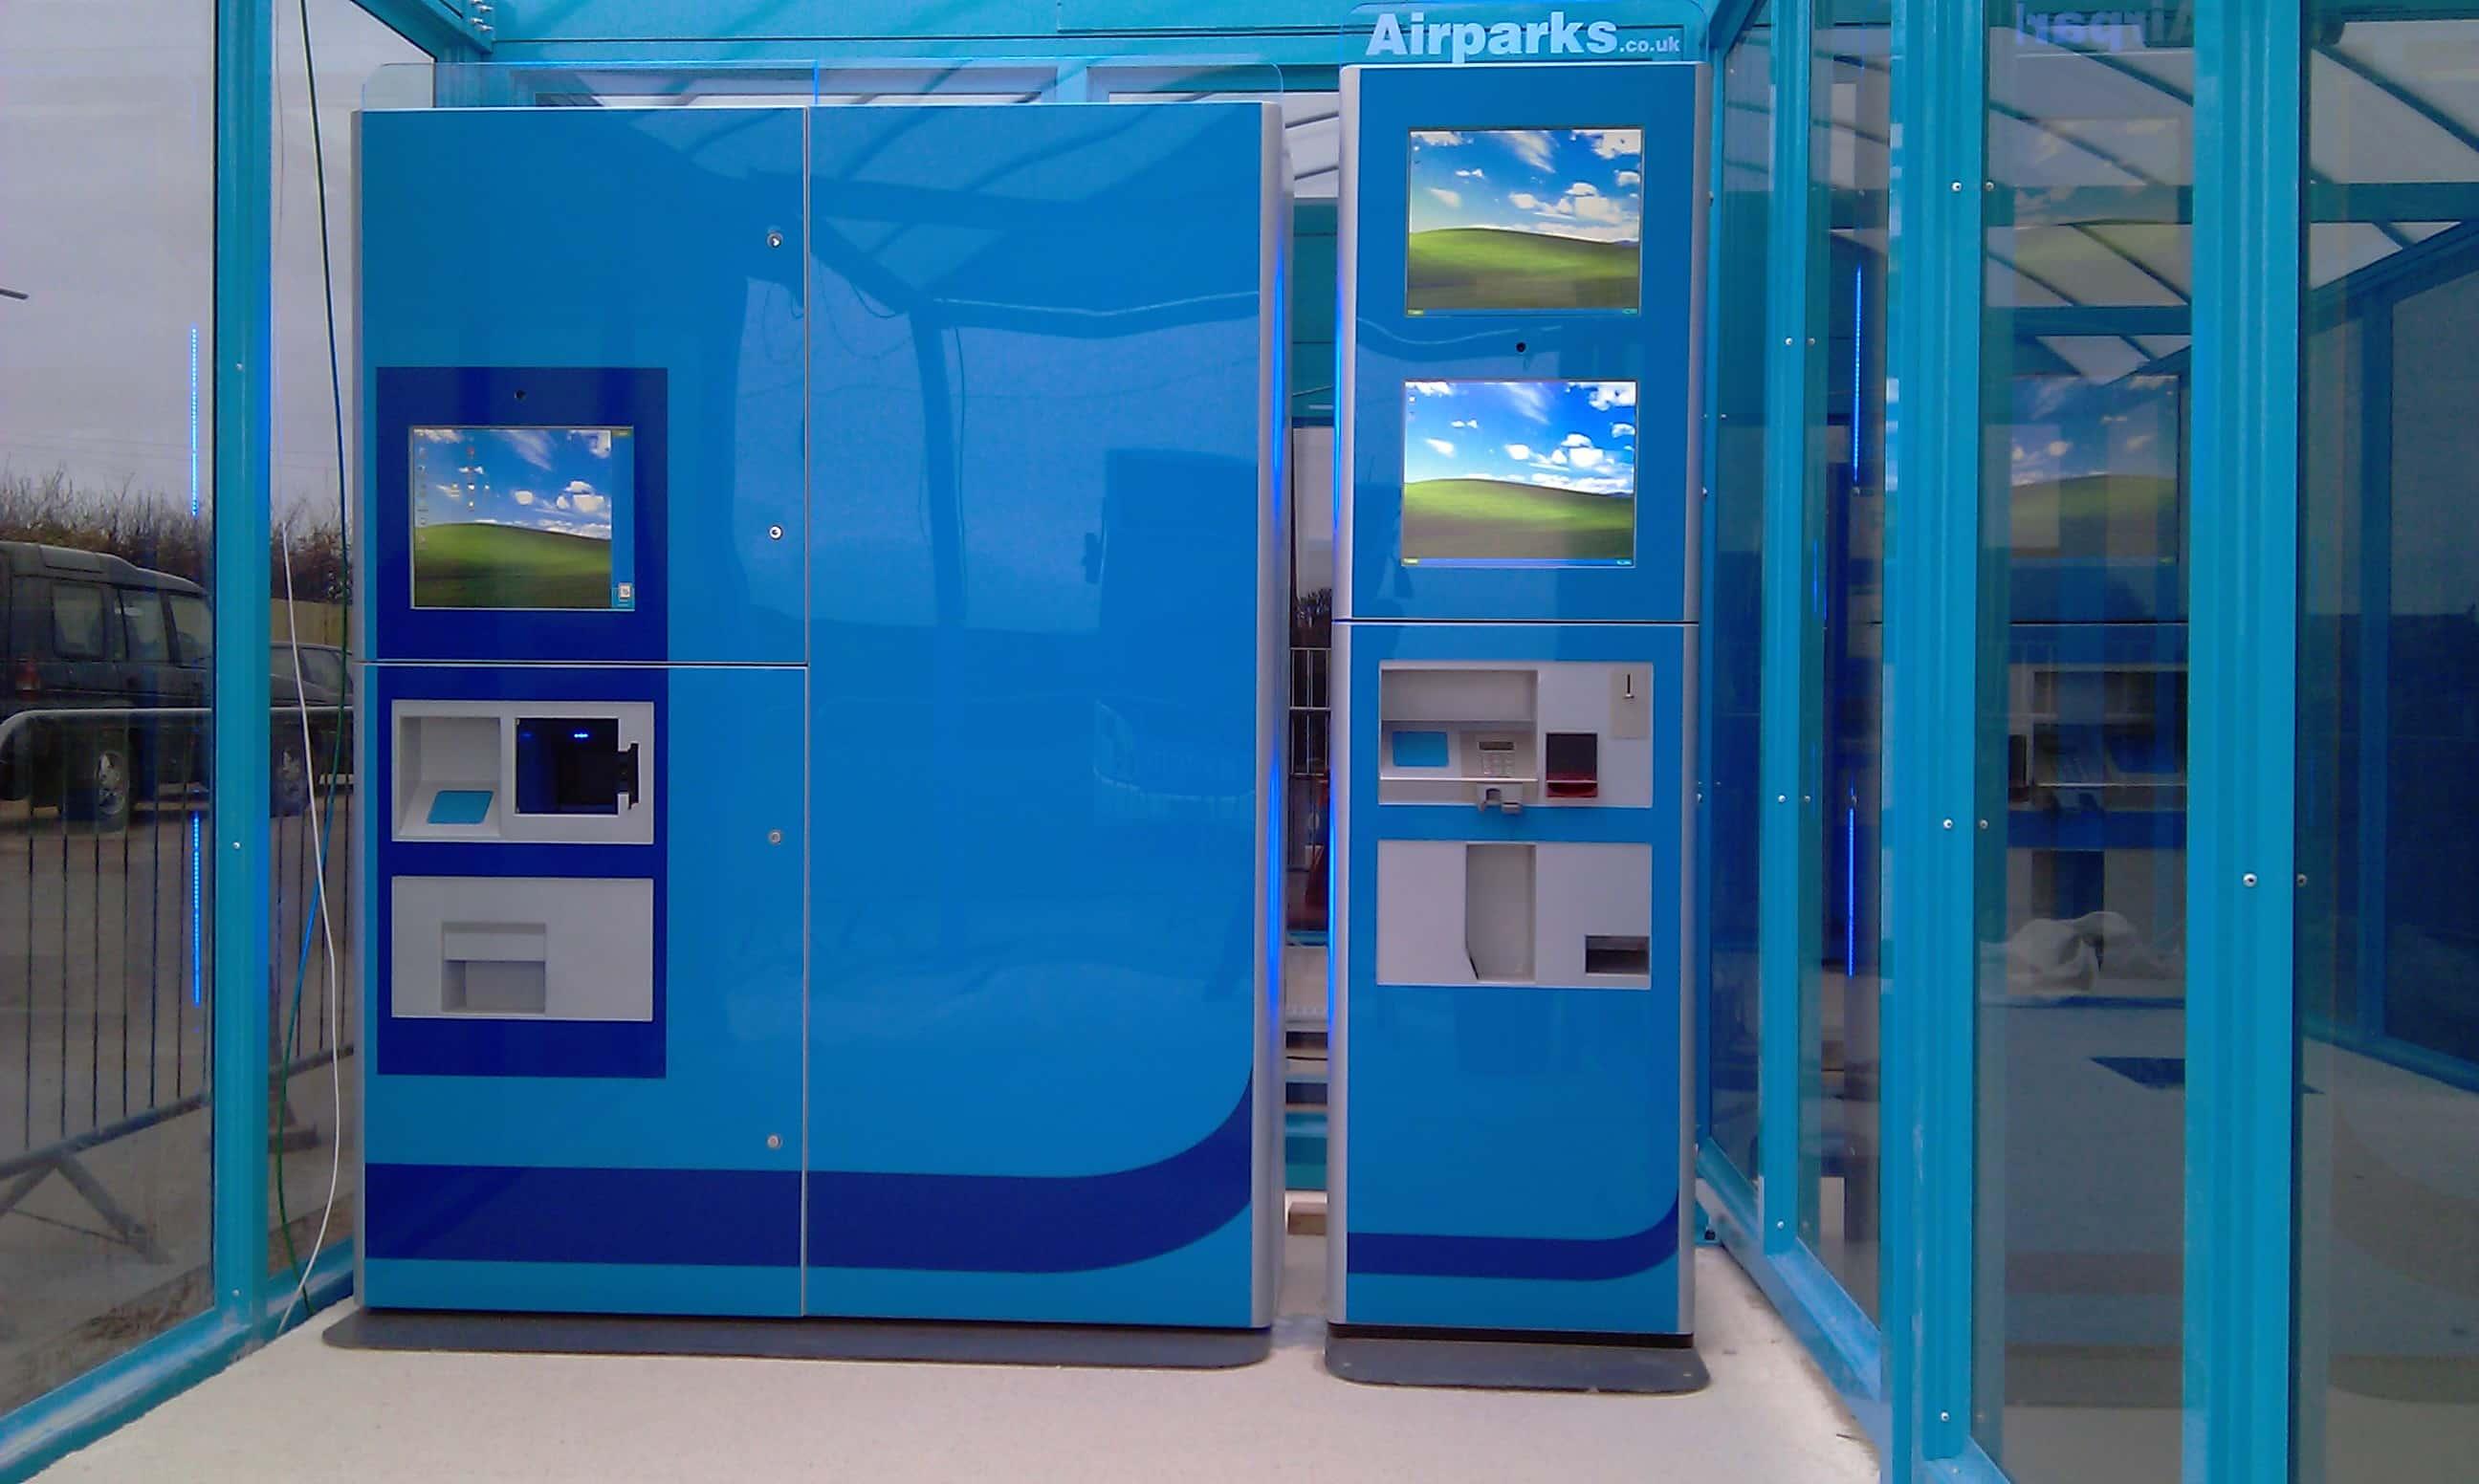 airport self kiosks